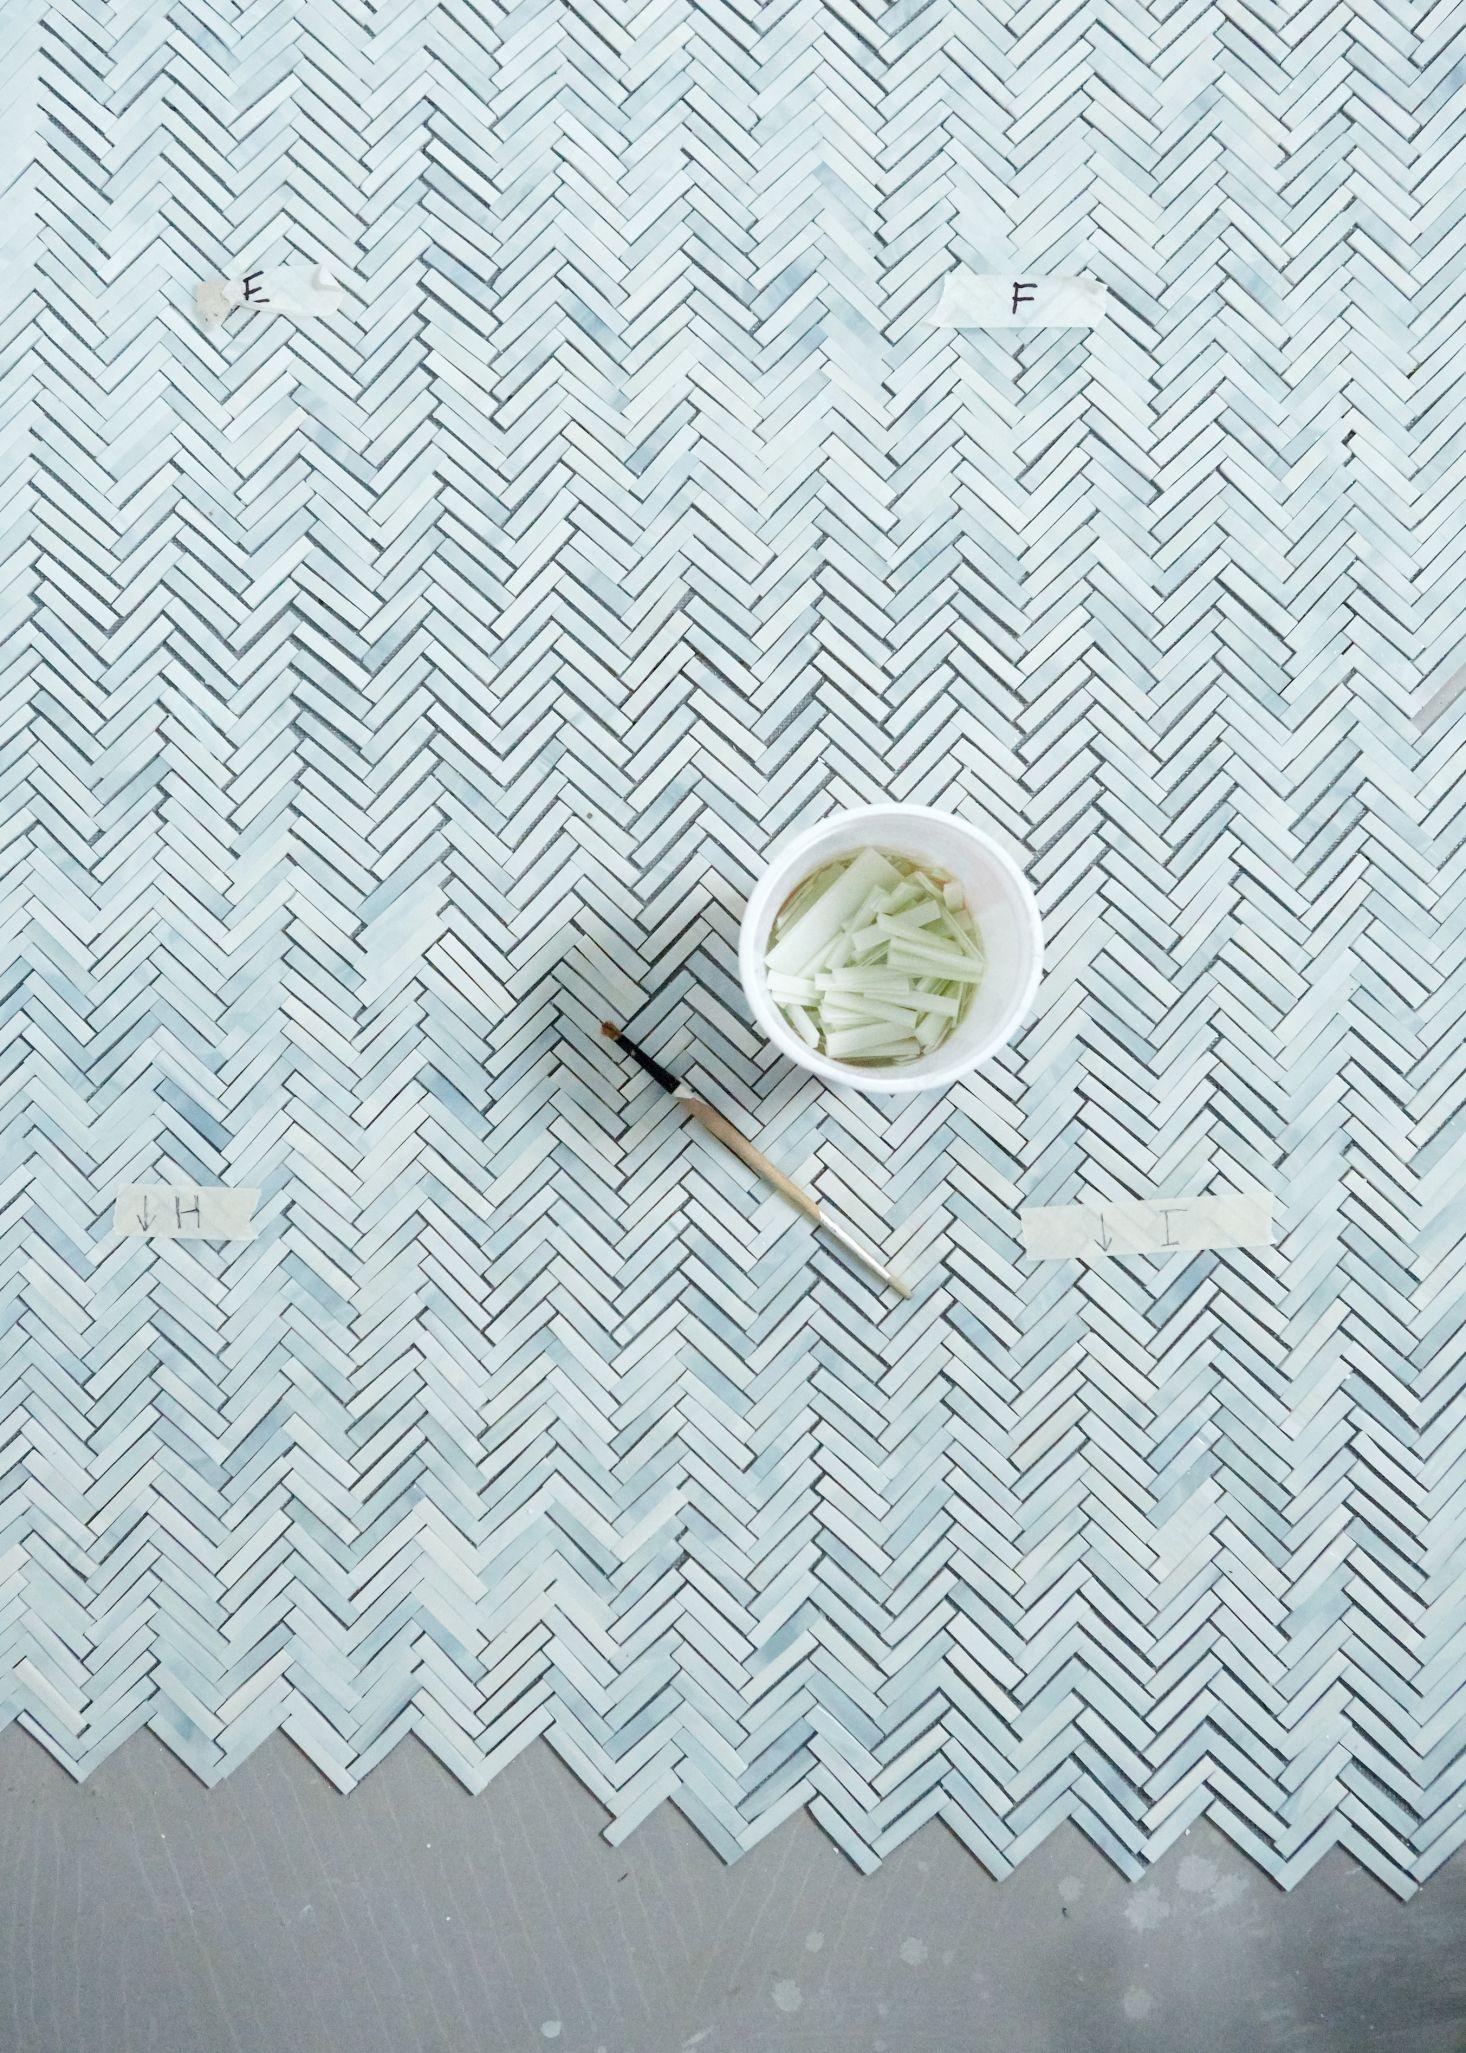 Bathroom of the Week: An Artist-Made Mosaic Tile Floor, Start to ...